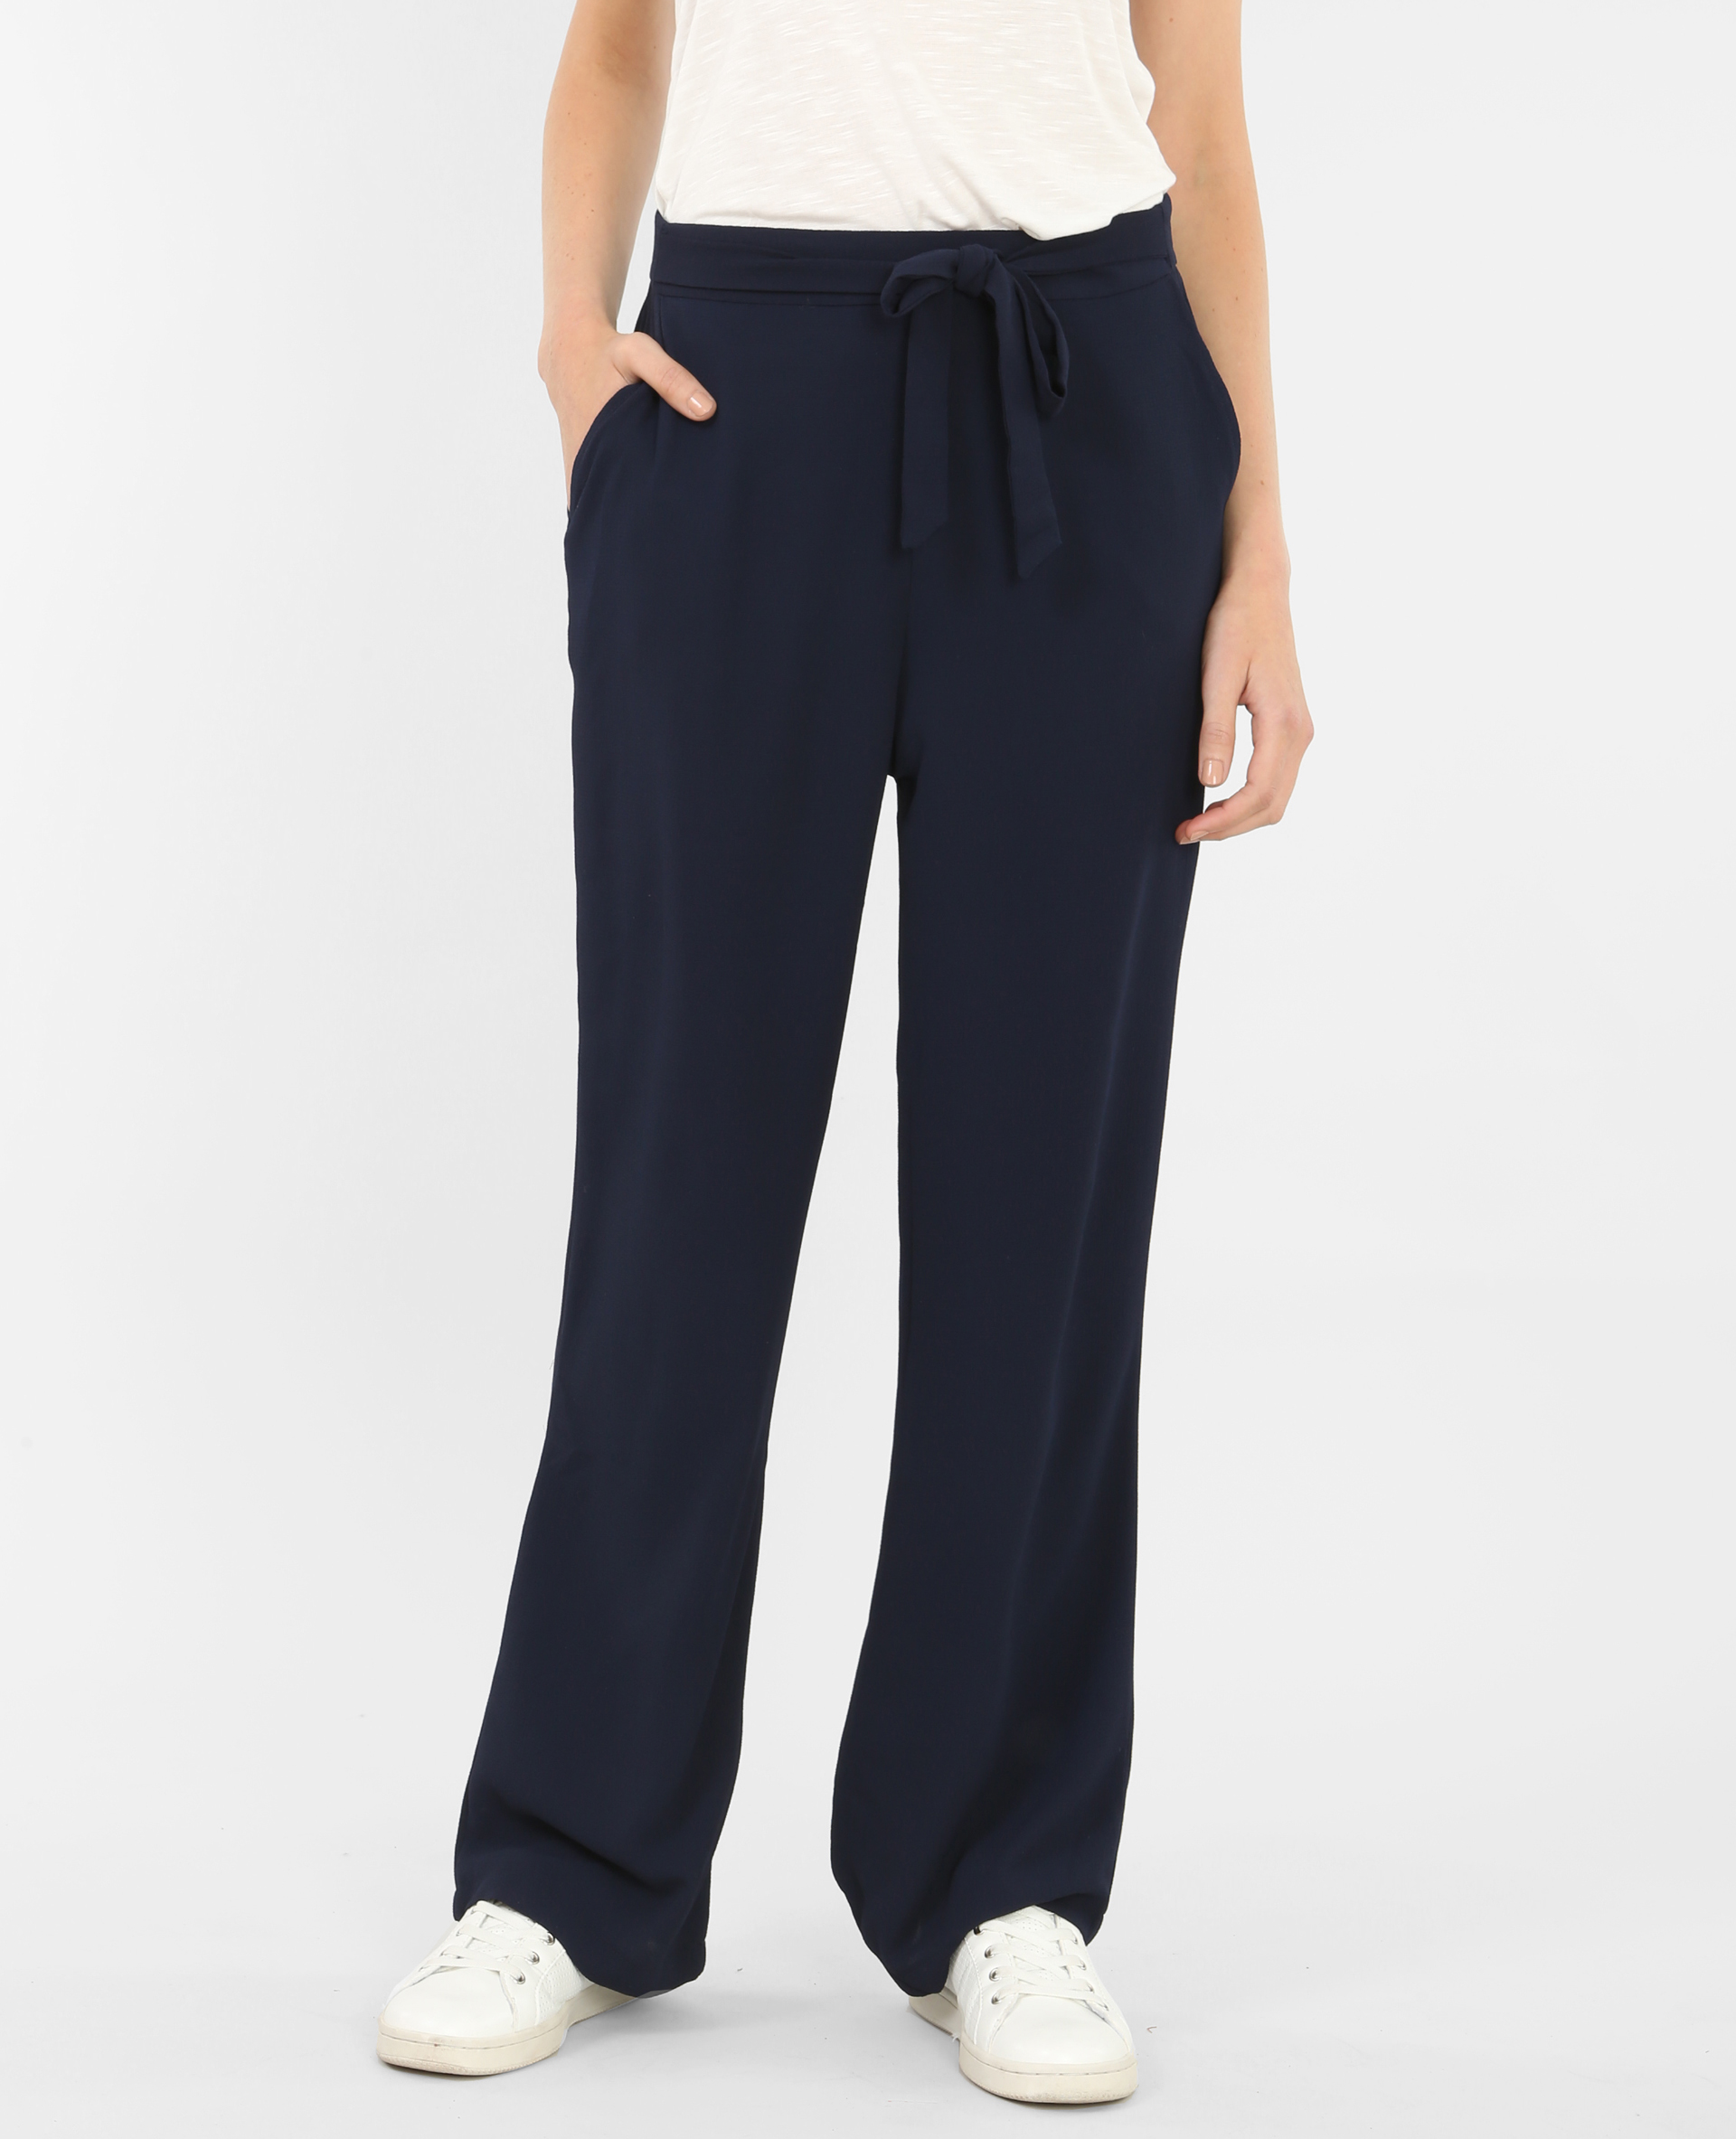 pantalon fluide large bleu marine 145136635a06 pimkie. Black Bedroom Furniture Sets. Home Design Ideas